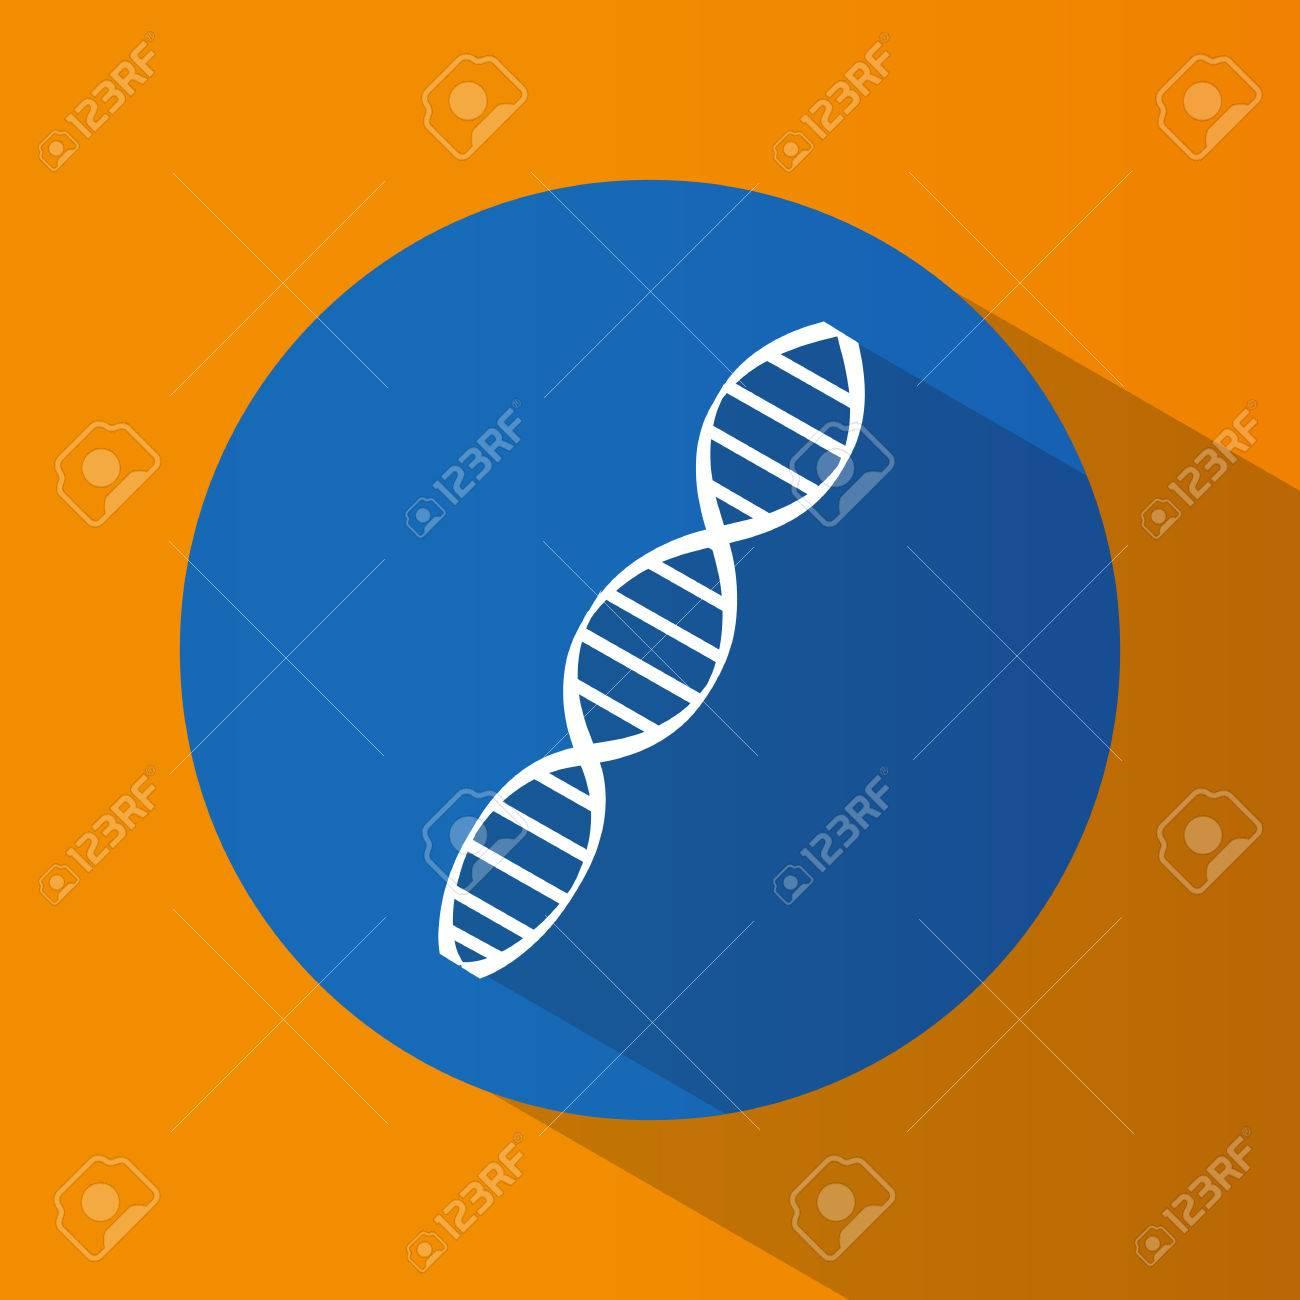 Heredity The Science Genetics Bright Flat Design